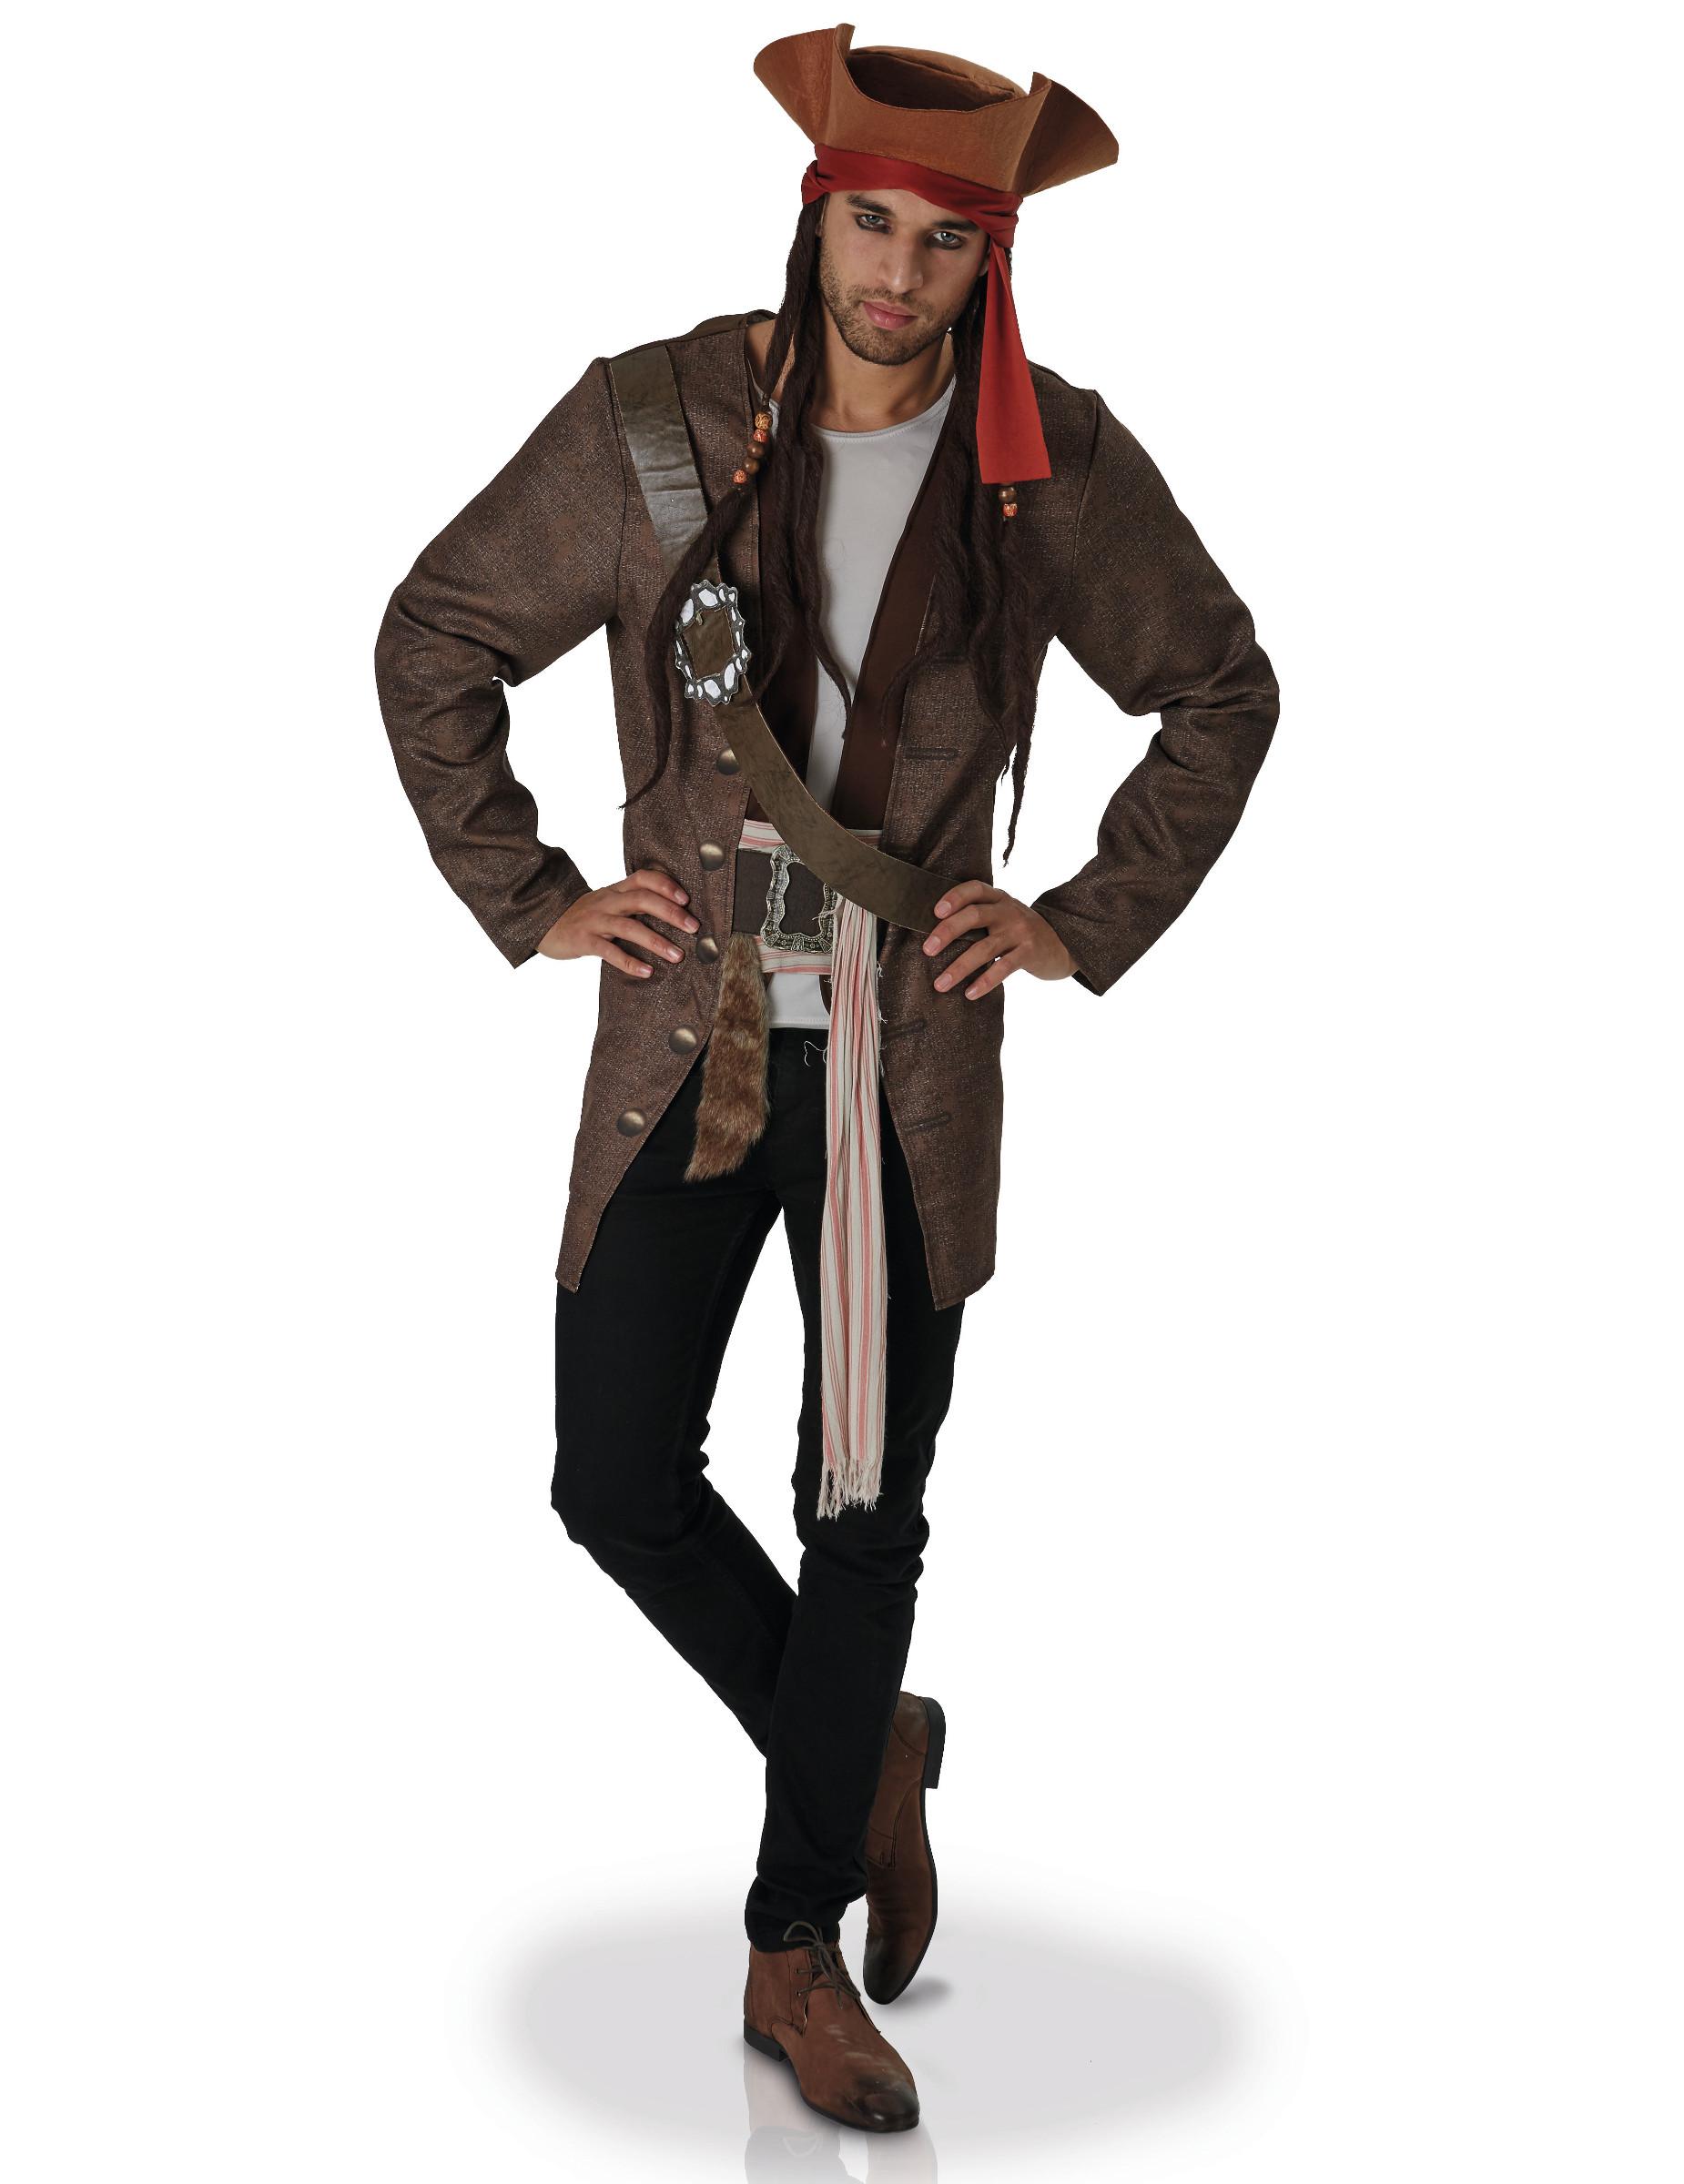 jack sparrow piratenkost m f r erwachsene kost me f r erwachsene und g nstige faschingskost me. Black Bedroom Furniture Sets. Home Design Ideas